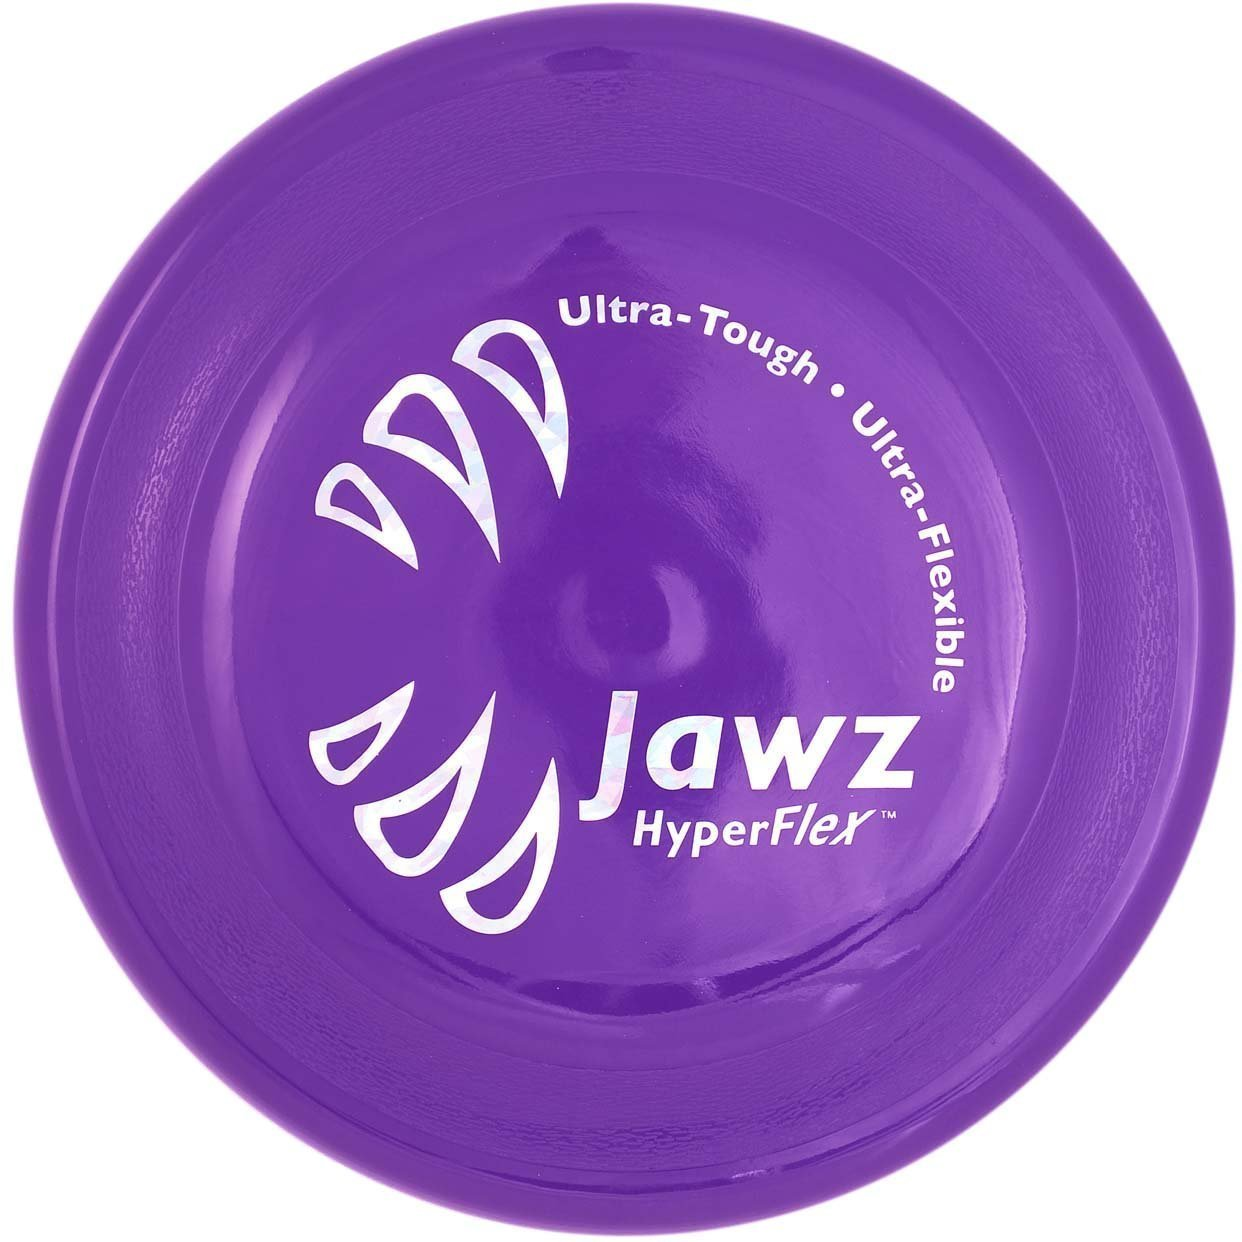 Hyperflite - K-10 Jawz Hyperflex Ultra Tough Dog Disc - 2 Pack by Hyperflite